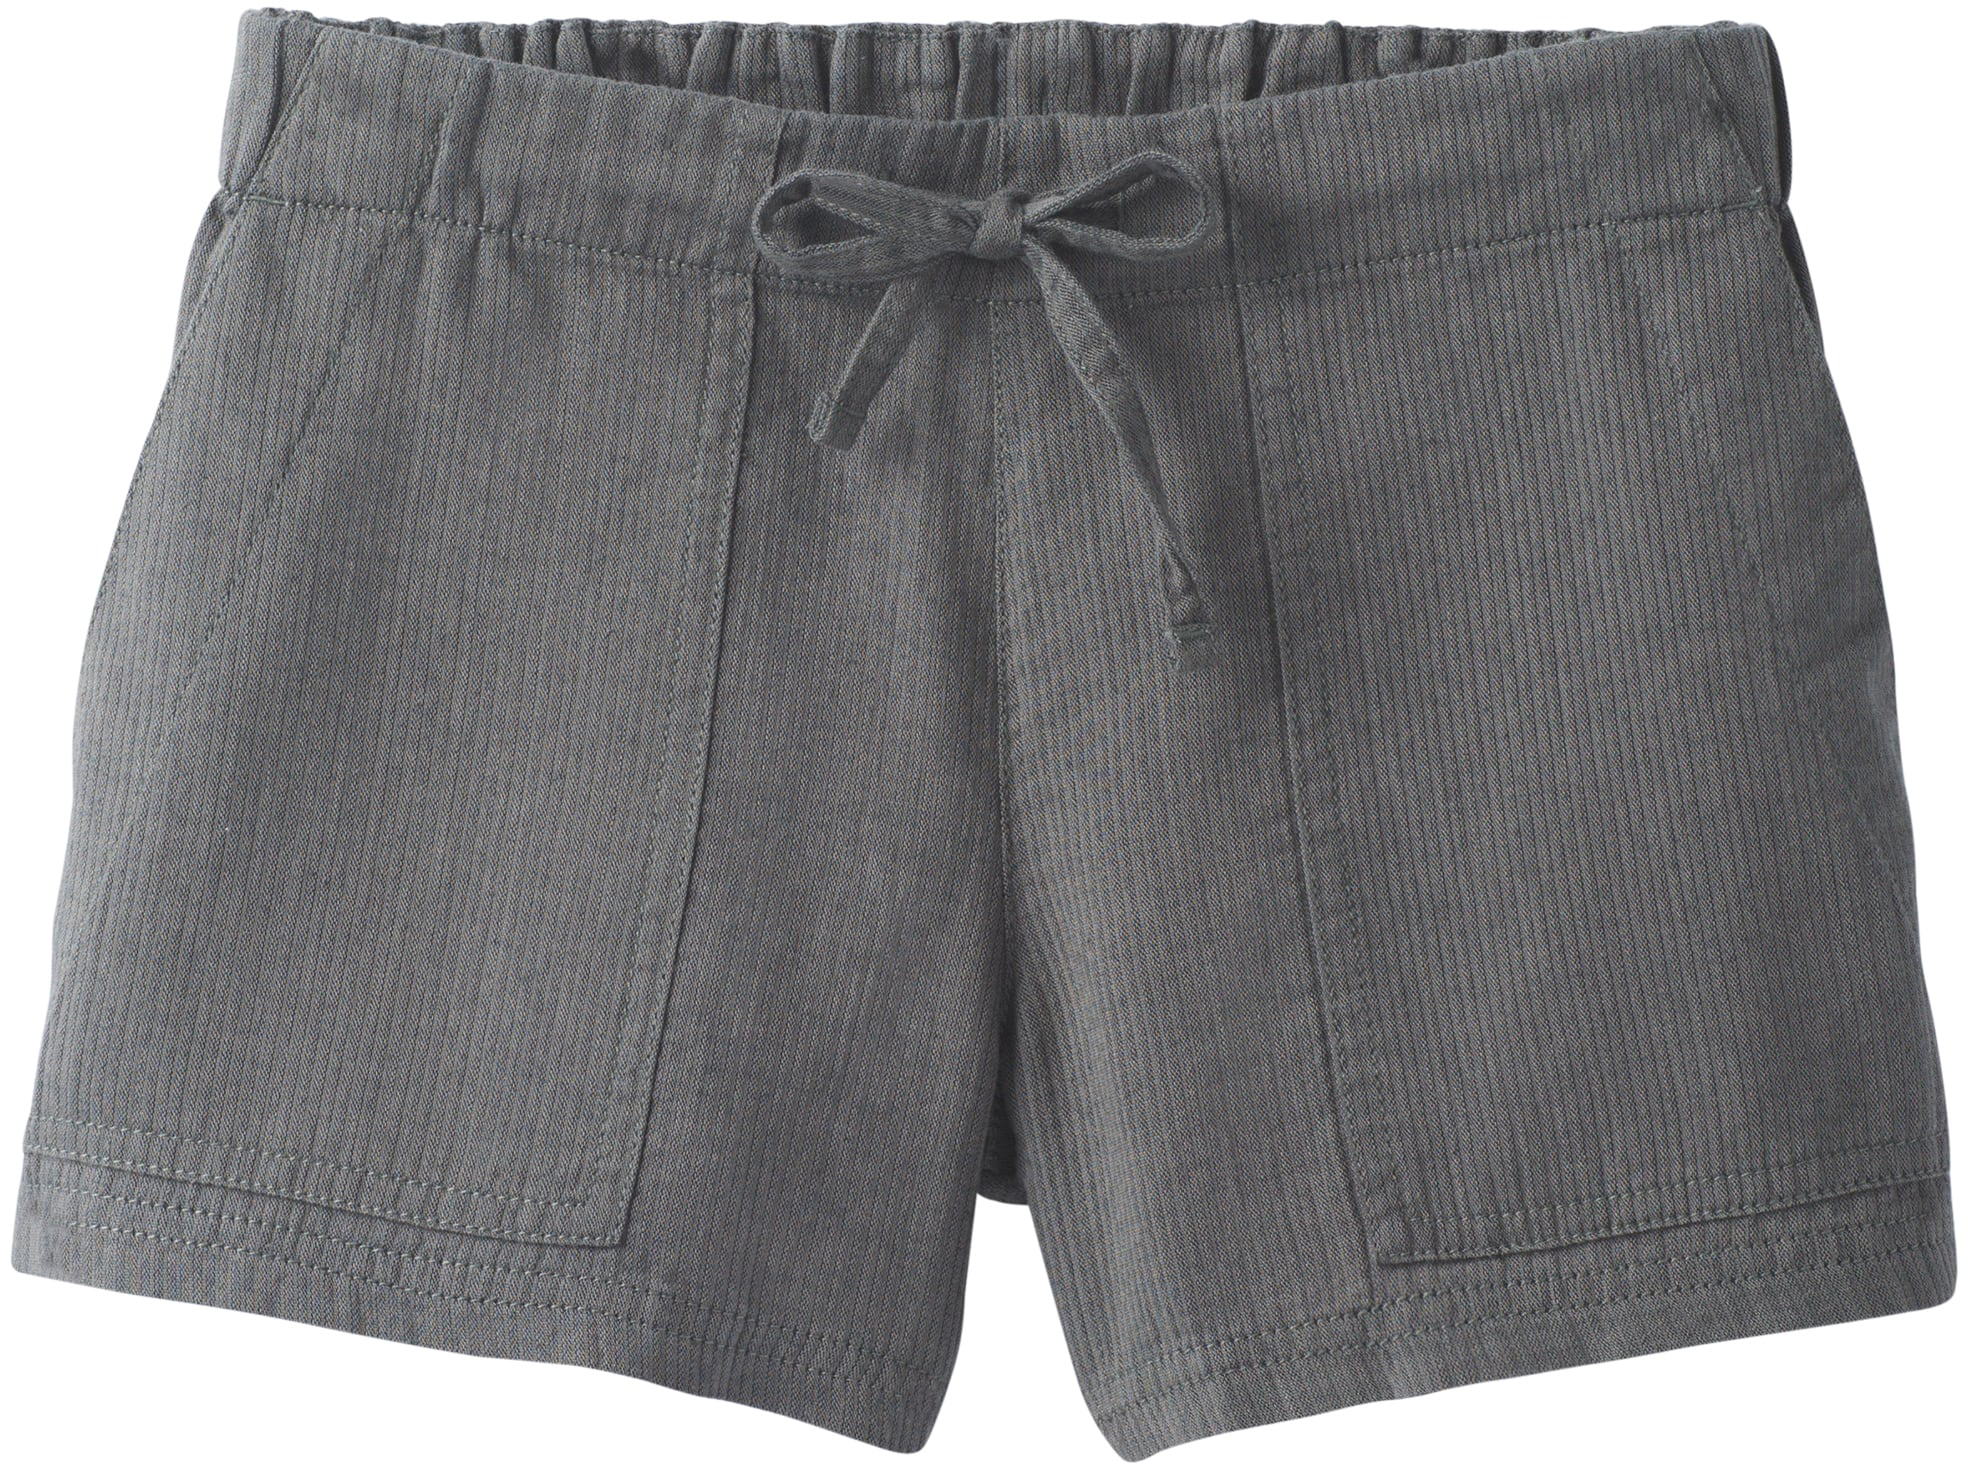 783d5ce82d Women's Shorts | MEC